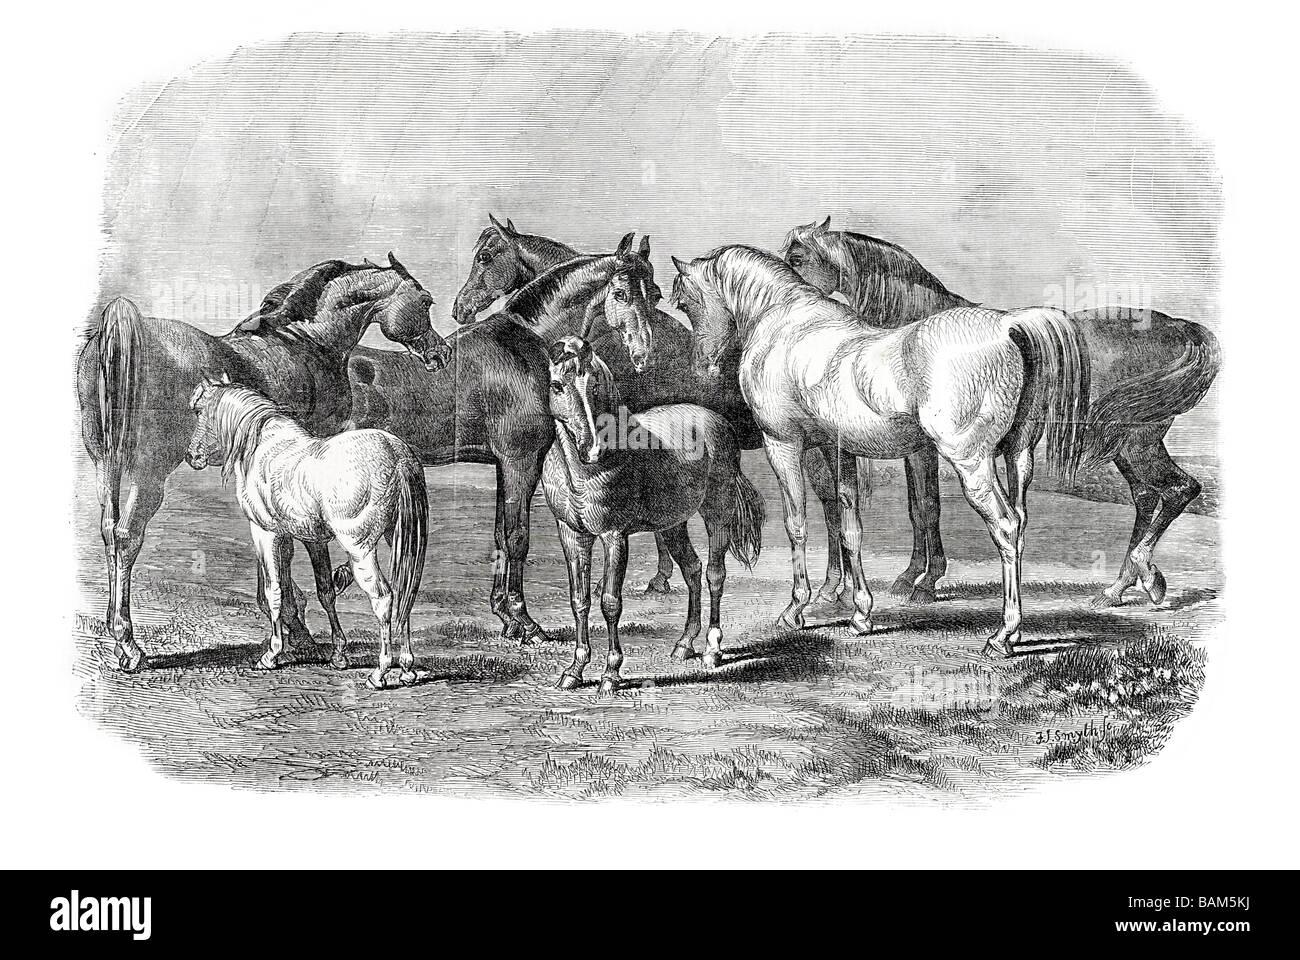 Pferd Pferde Hengst Stute foul Hufen Huftier Säugetier zu zähmen Pferde Ponys Farmerfamilie Arbeit wilde Stockbild